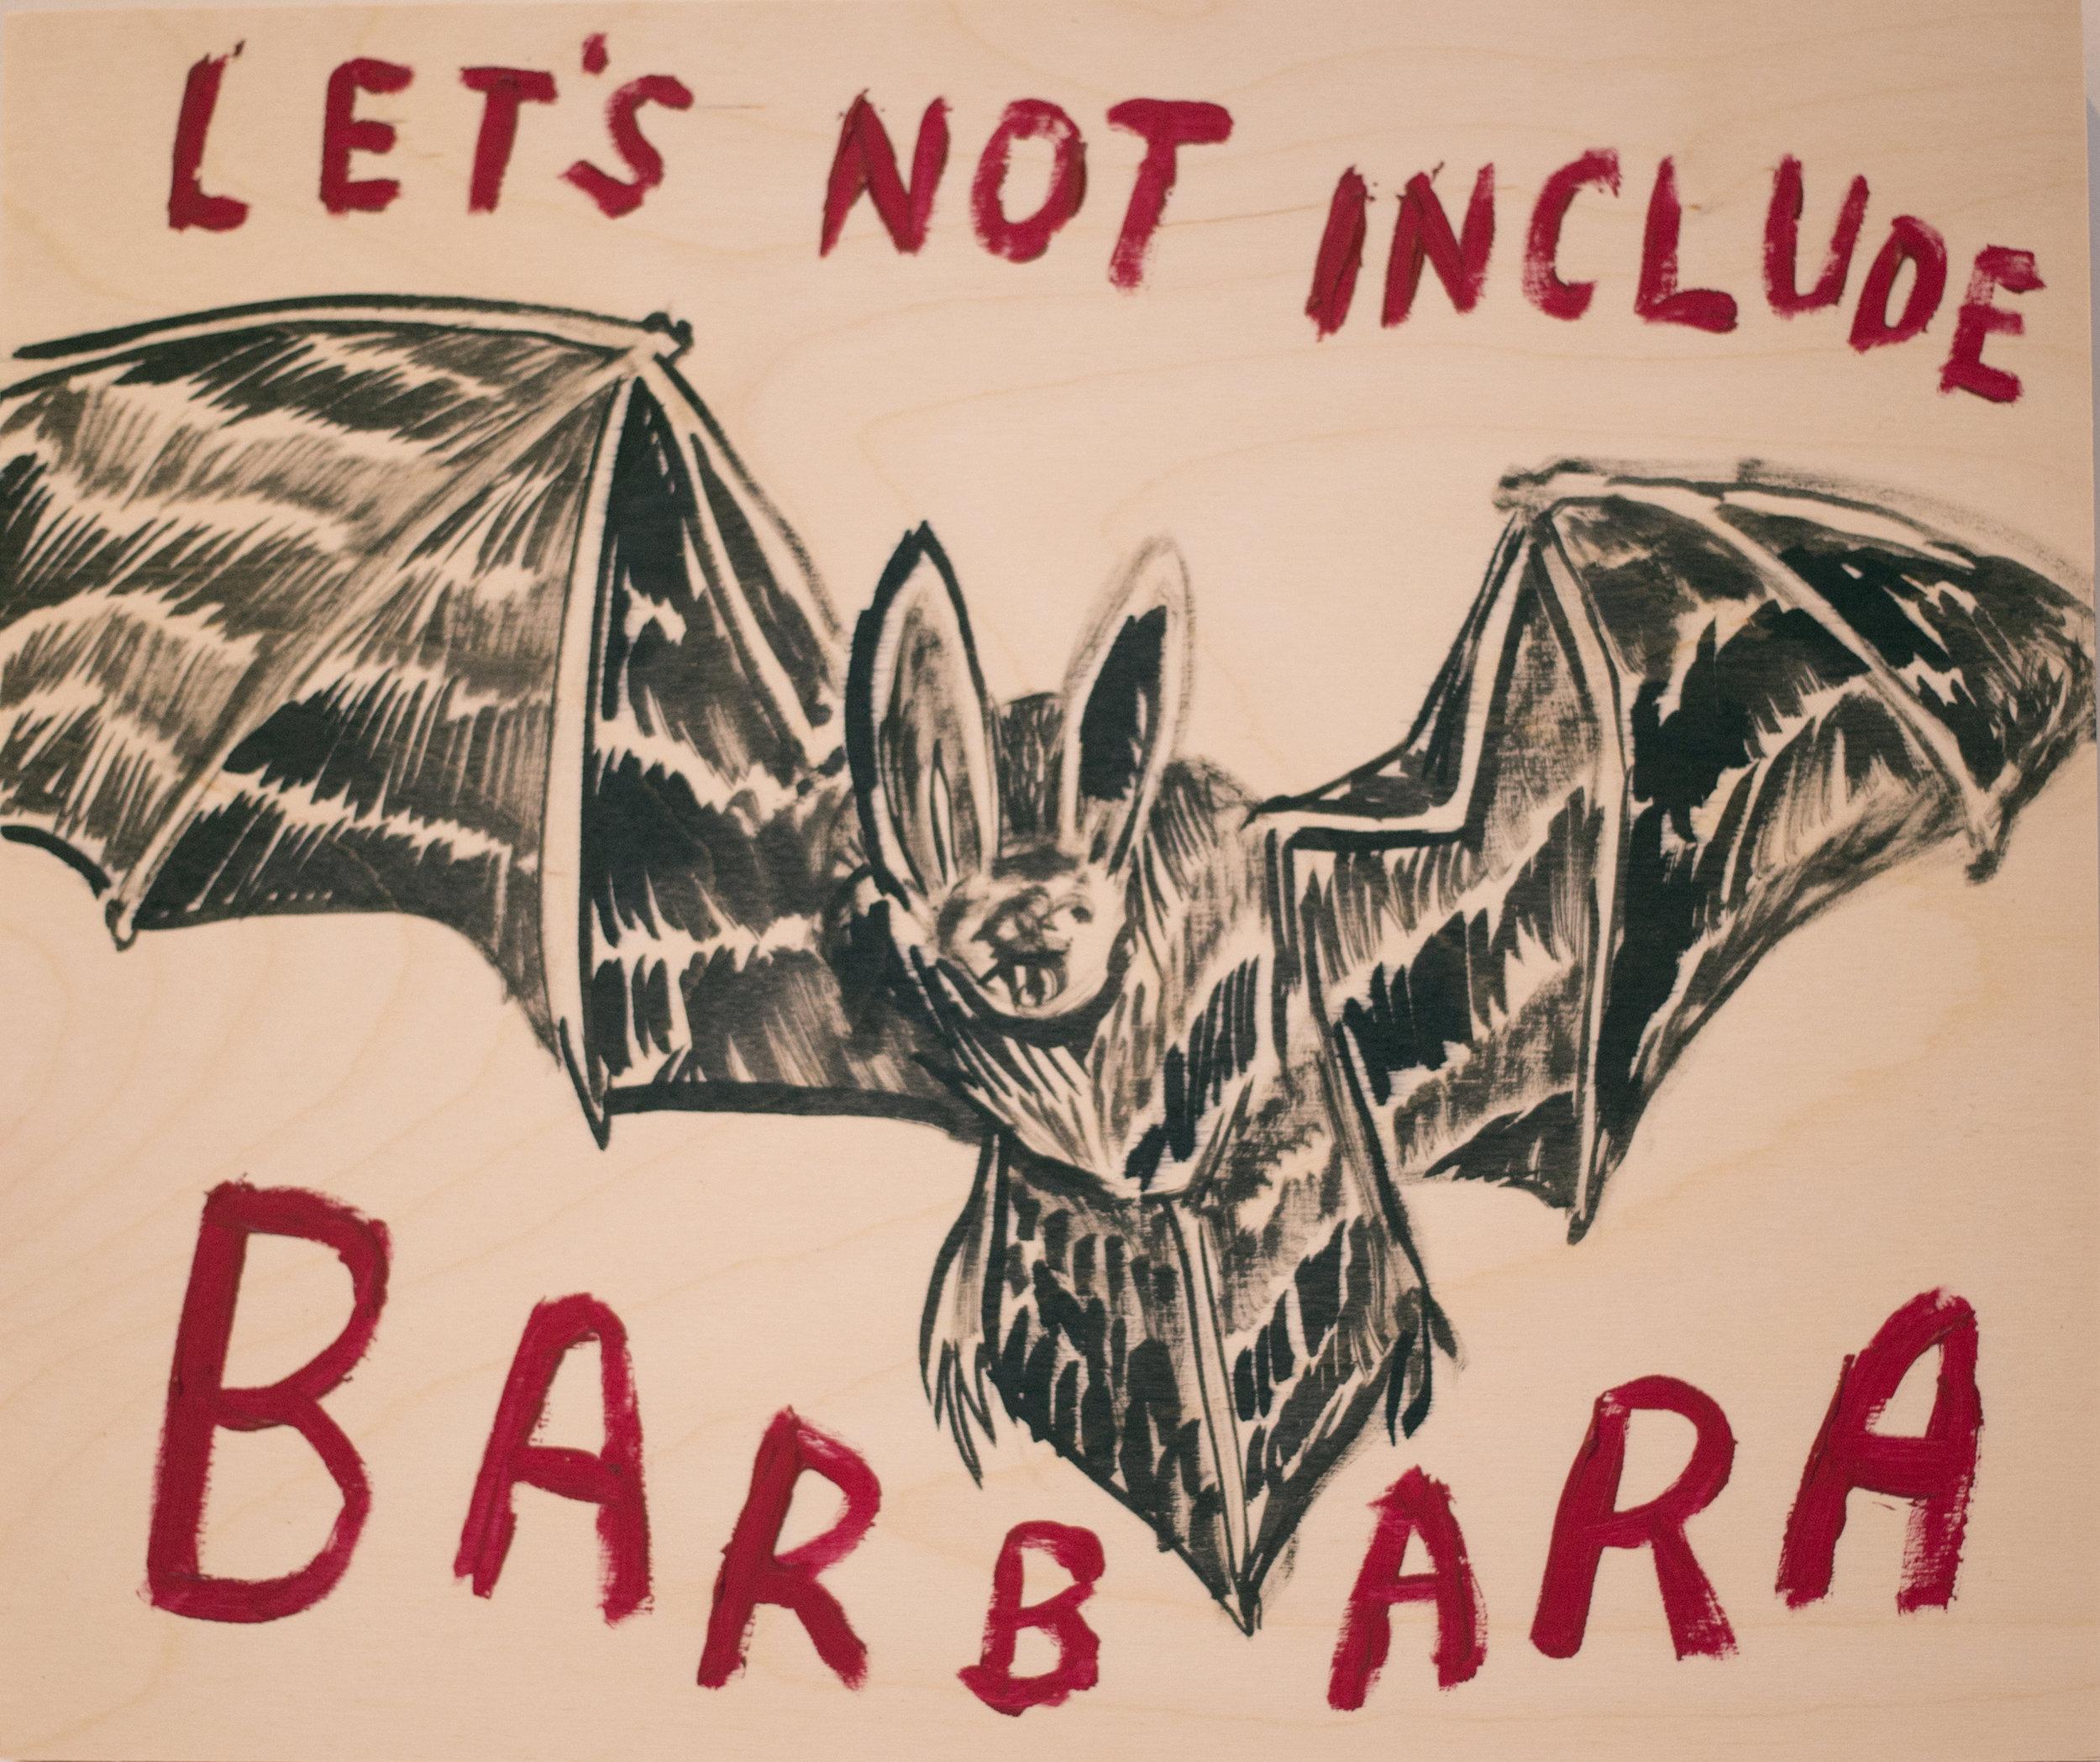 Let's Not Include Barbara.jpg